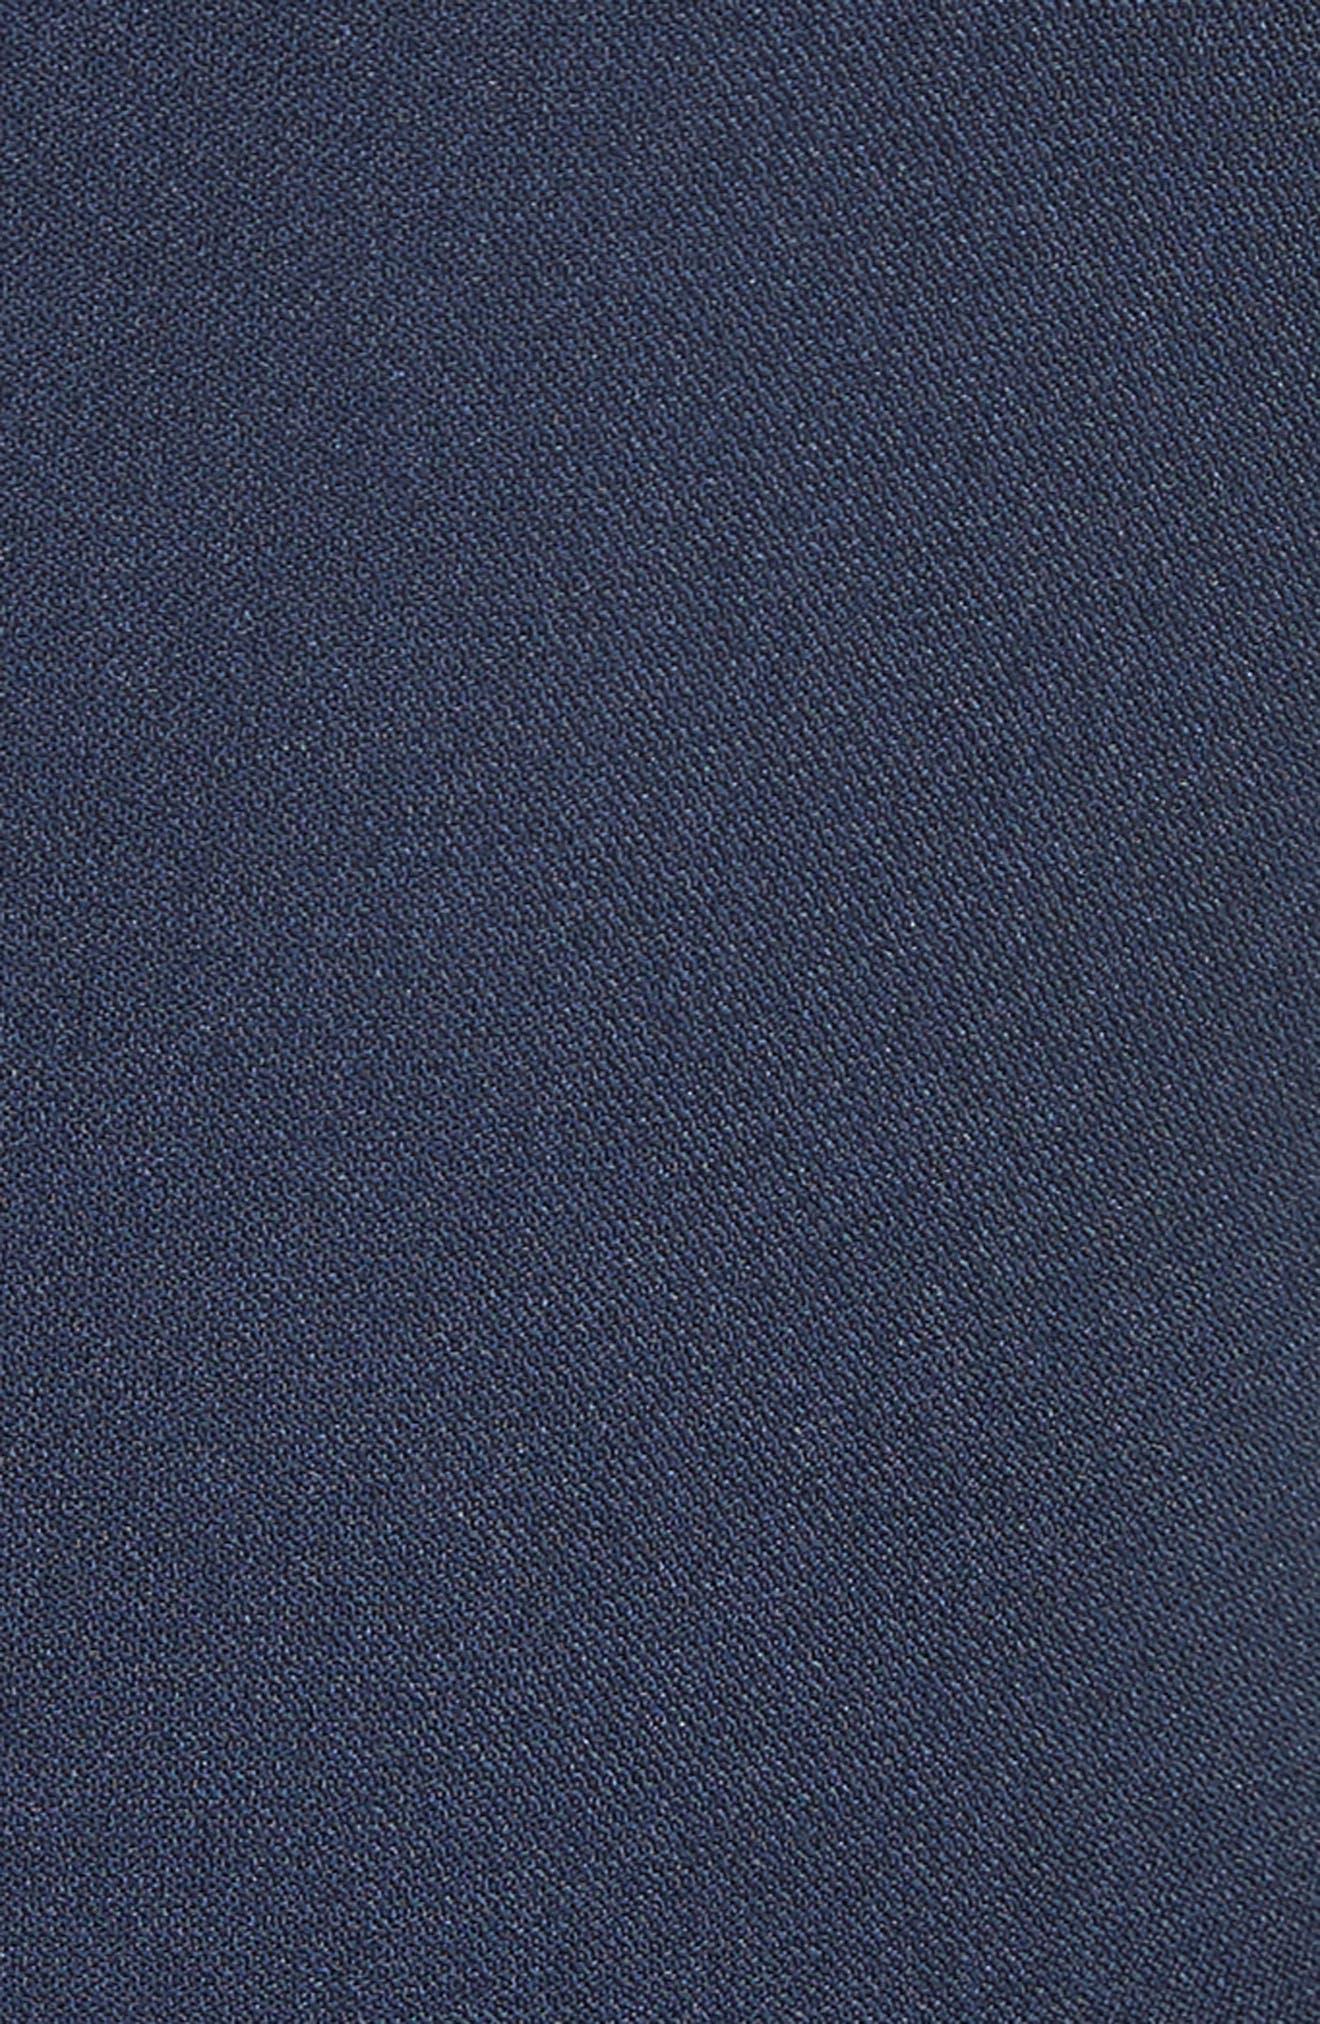 Aylin Bell Sleeve Dress,                             Alternate thumbnail 6, color,                             400